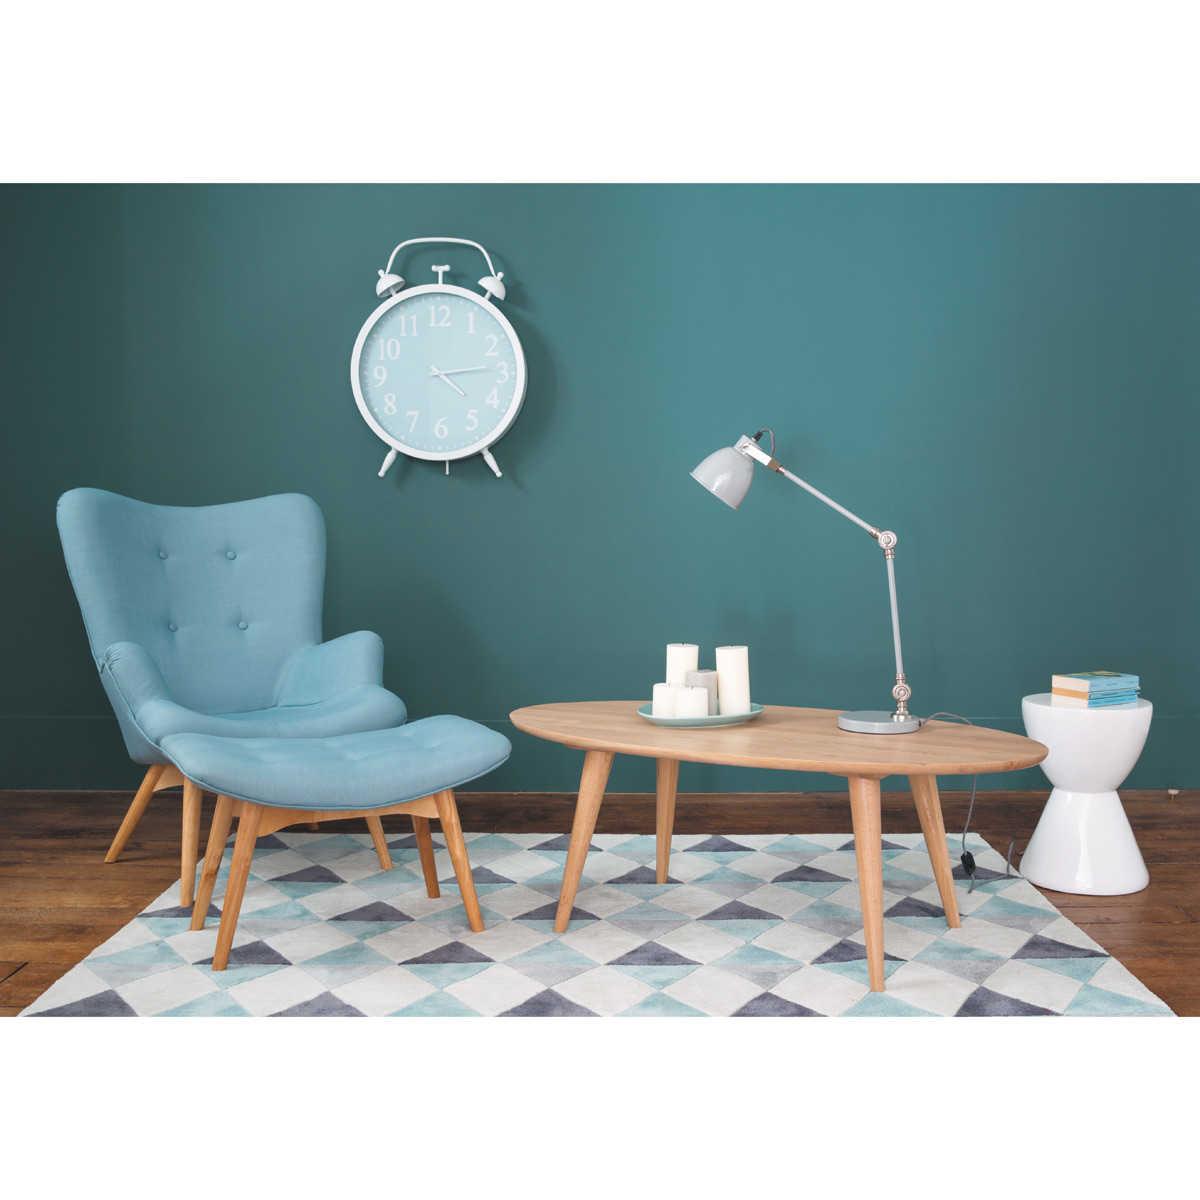 maison du monde st quentin. Black Bedroom Furniture Sets. Home Design Ideas